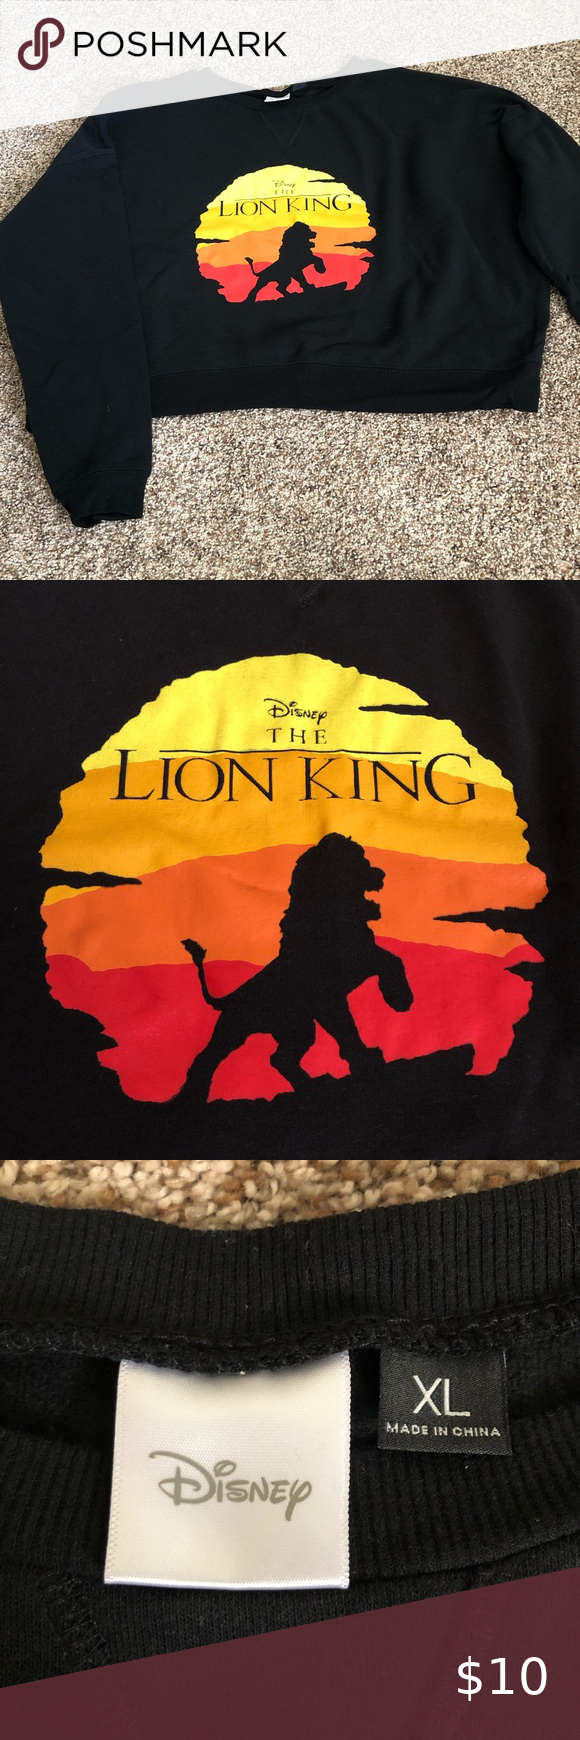 Cropped Lion King Sweatshirt Sweatshirts Disney Sweaters Lion King [ 1740 x 580 Pixel ]